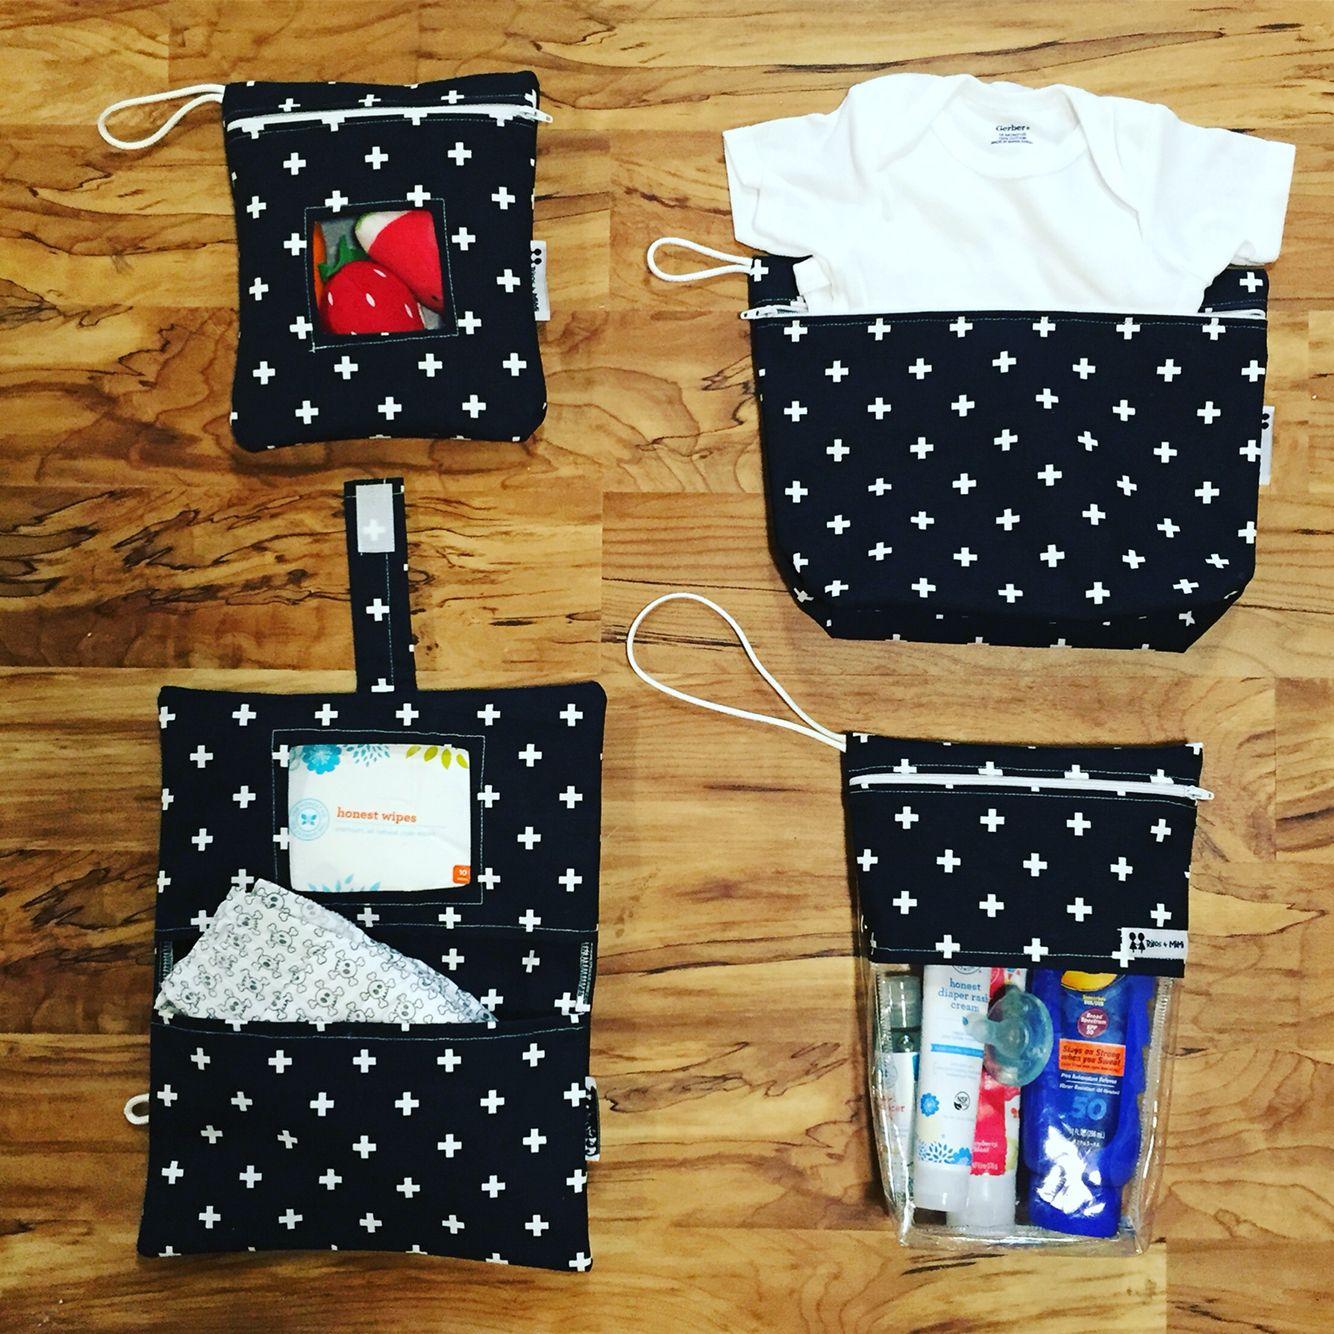 Diaper bag organization by Rilos + MiMi                                                                                                                                                                                 More